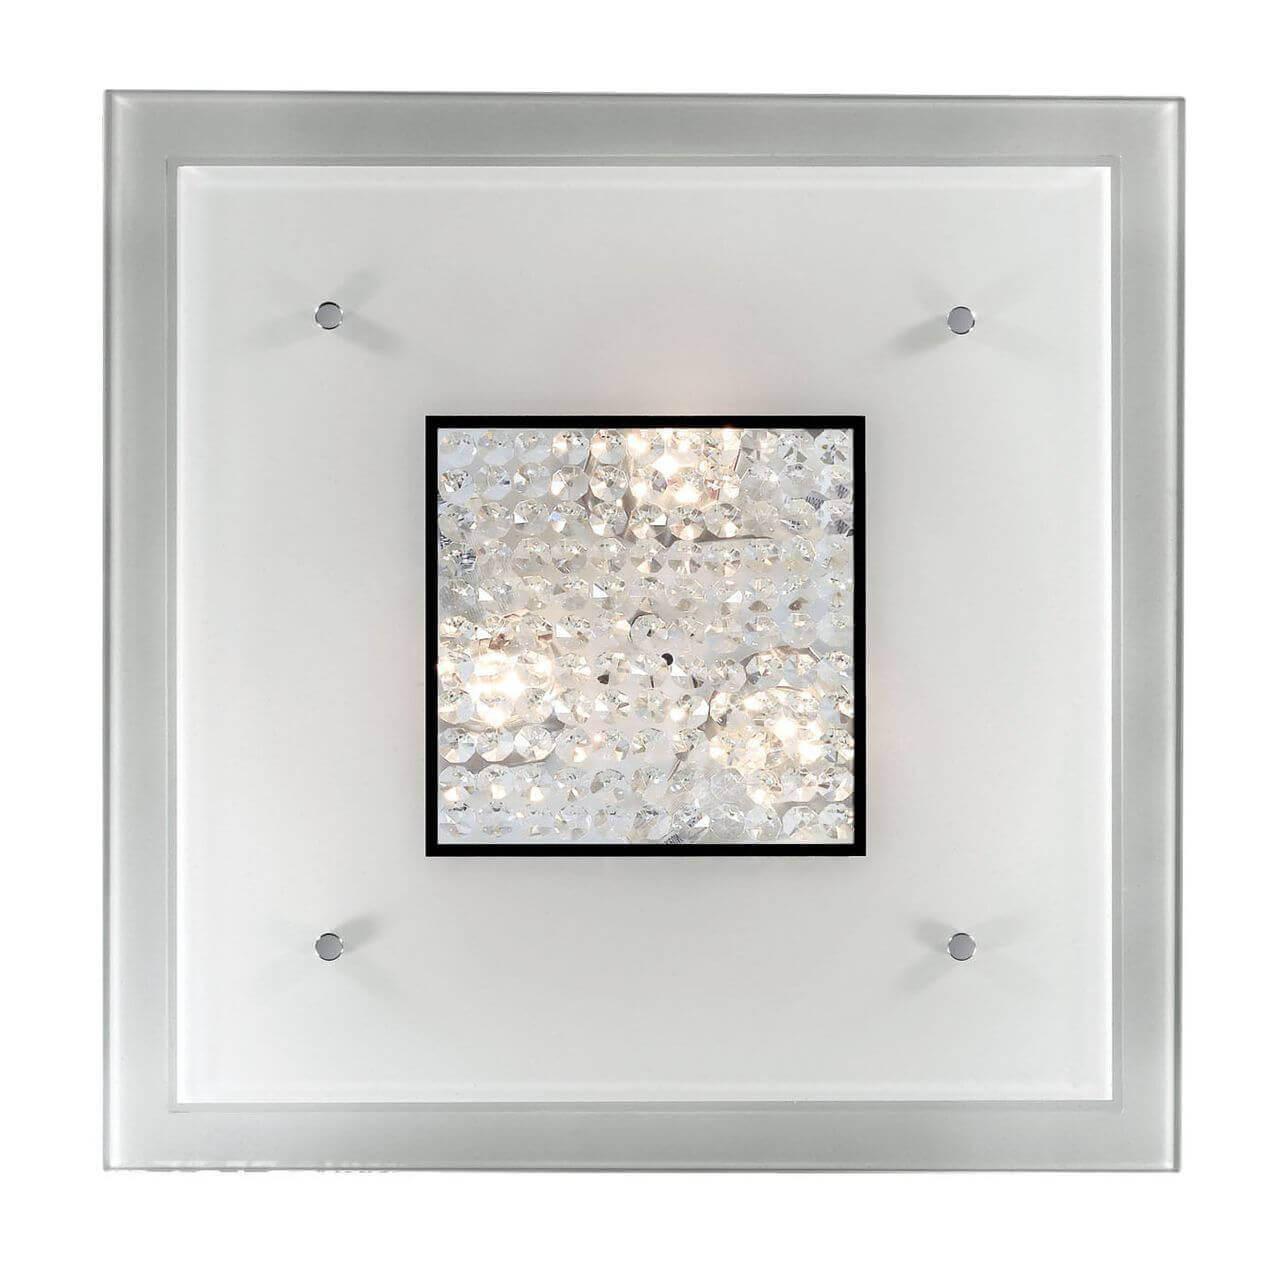 Светильник Ideal Lux Steno PL3 Steno светильник потолочный ideal lux harem harem pl3